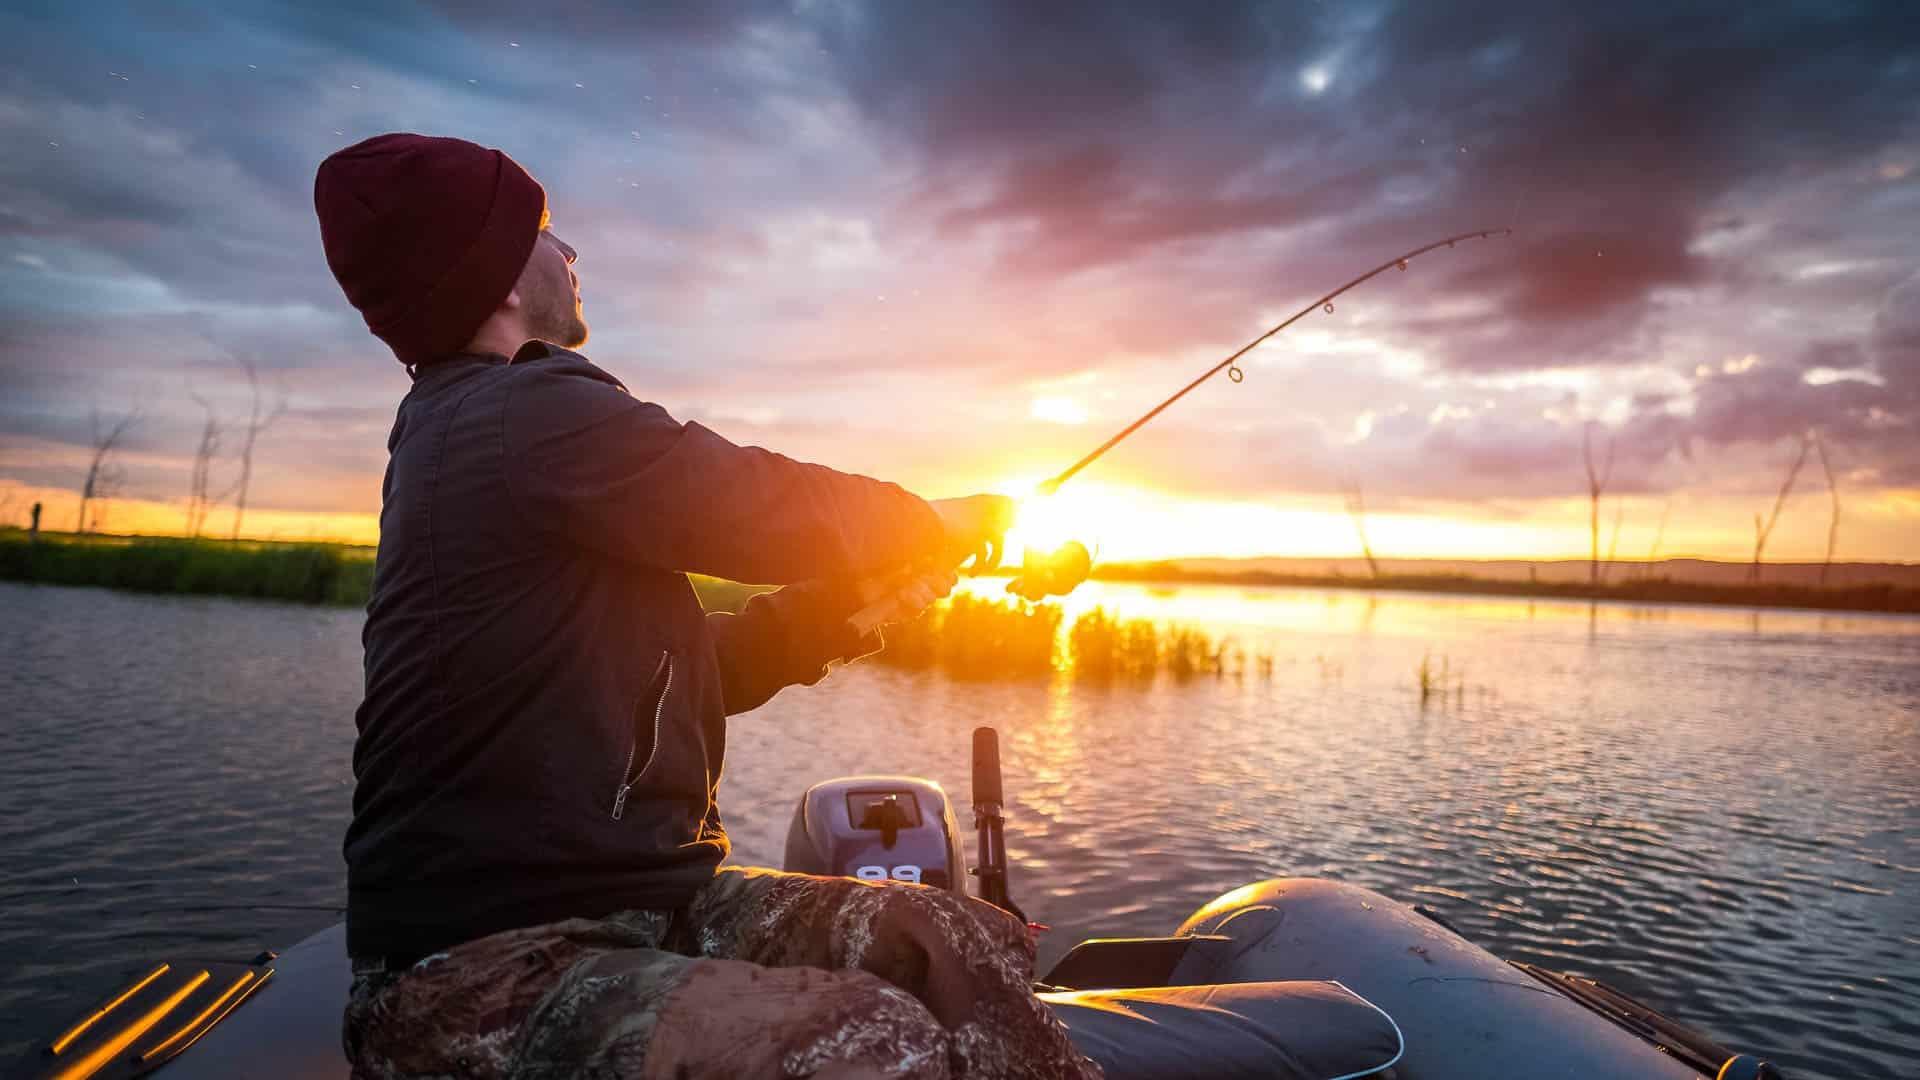 Календарь рыбака на август 2019: благоприятные дни августа 2019 года для клева рыбы